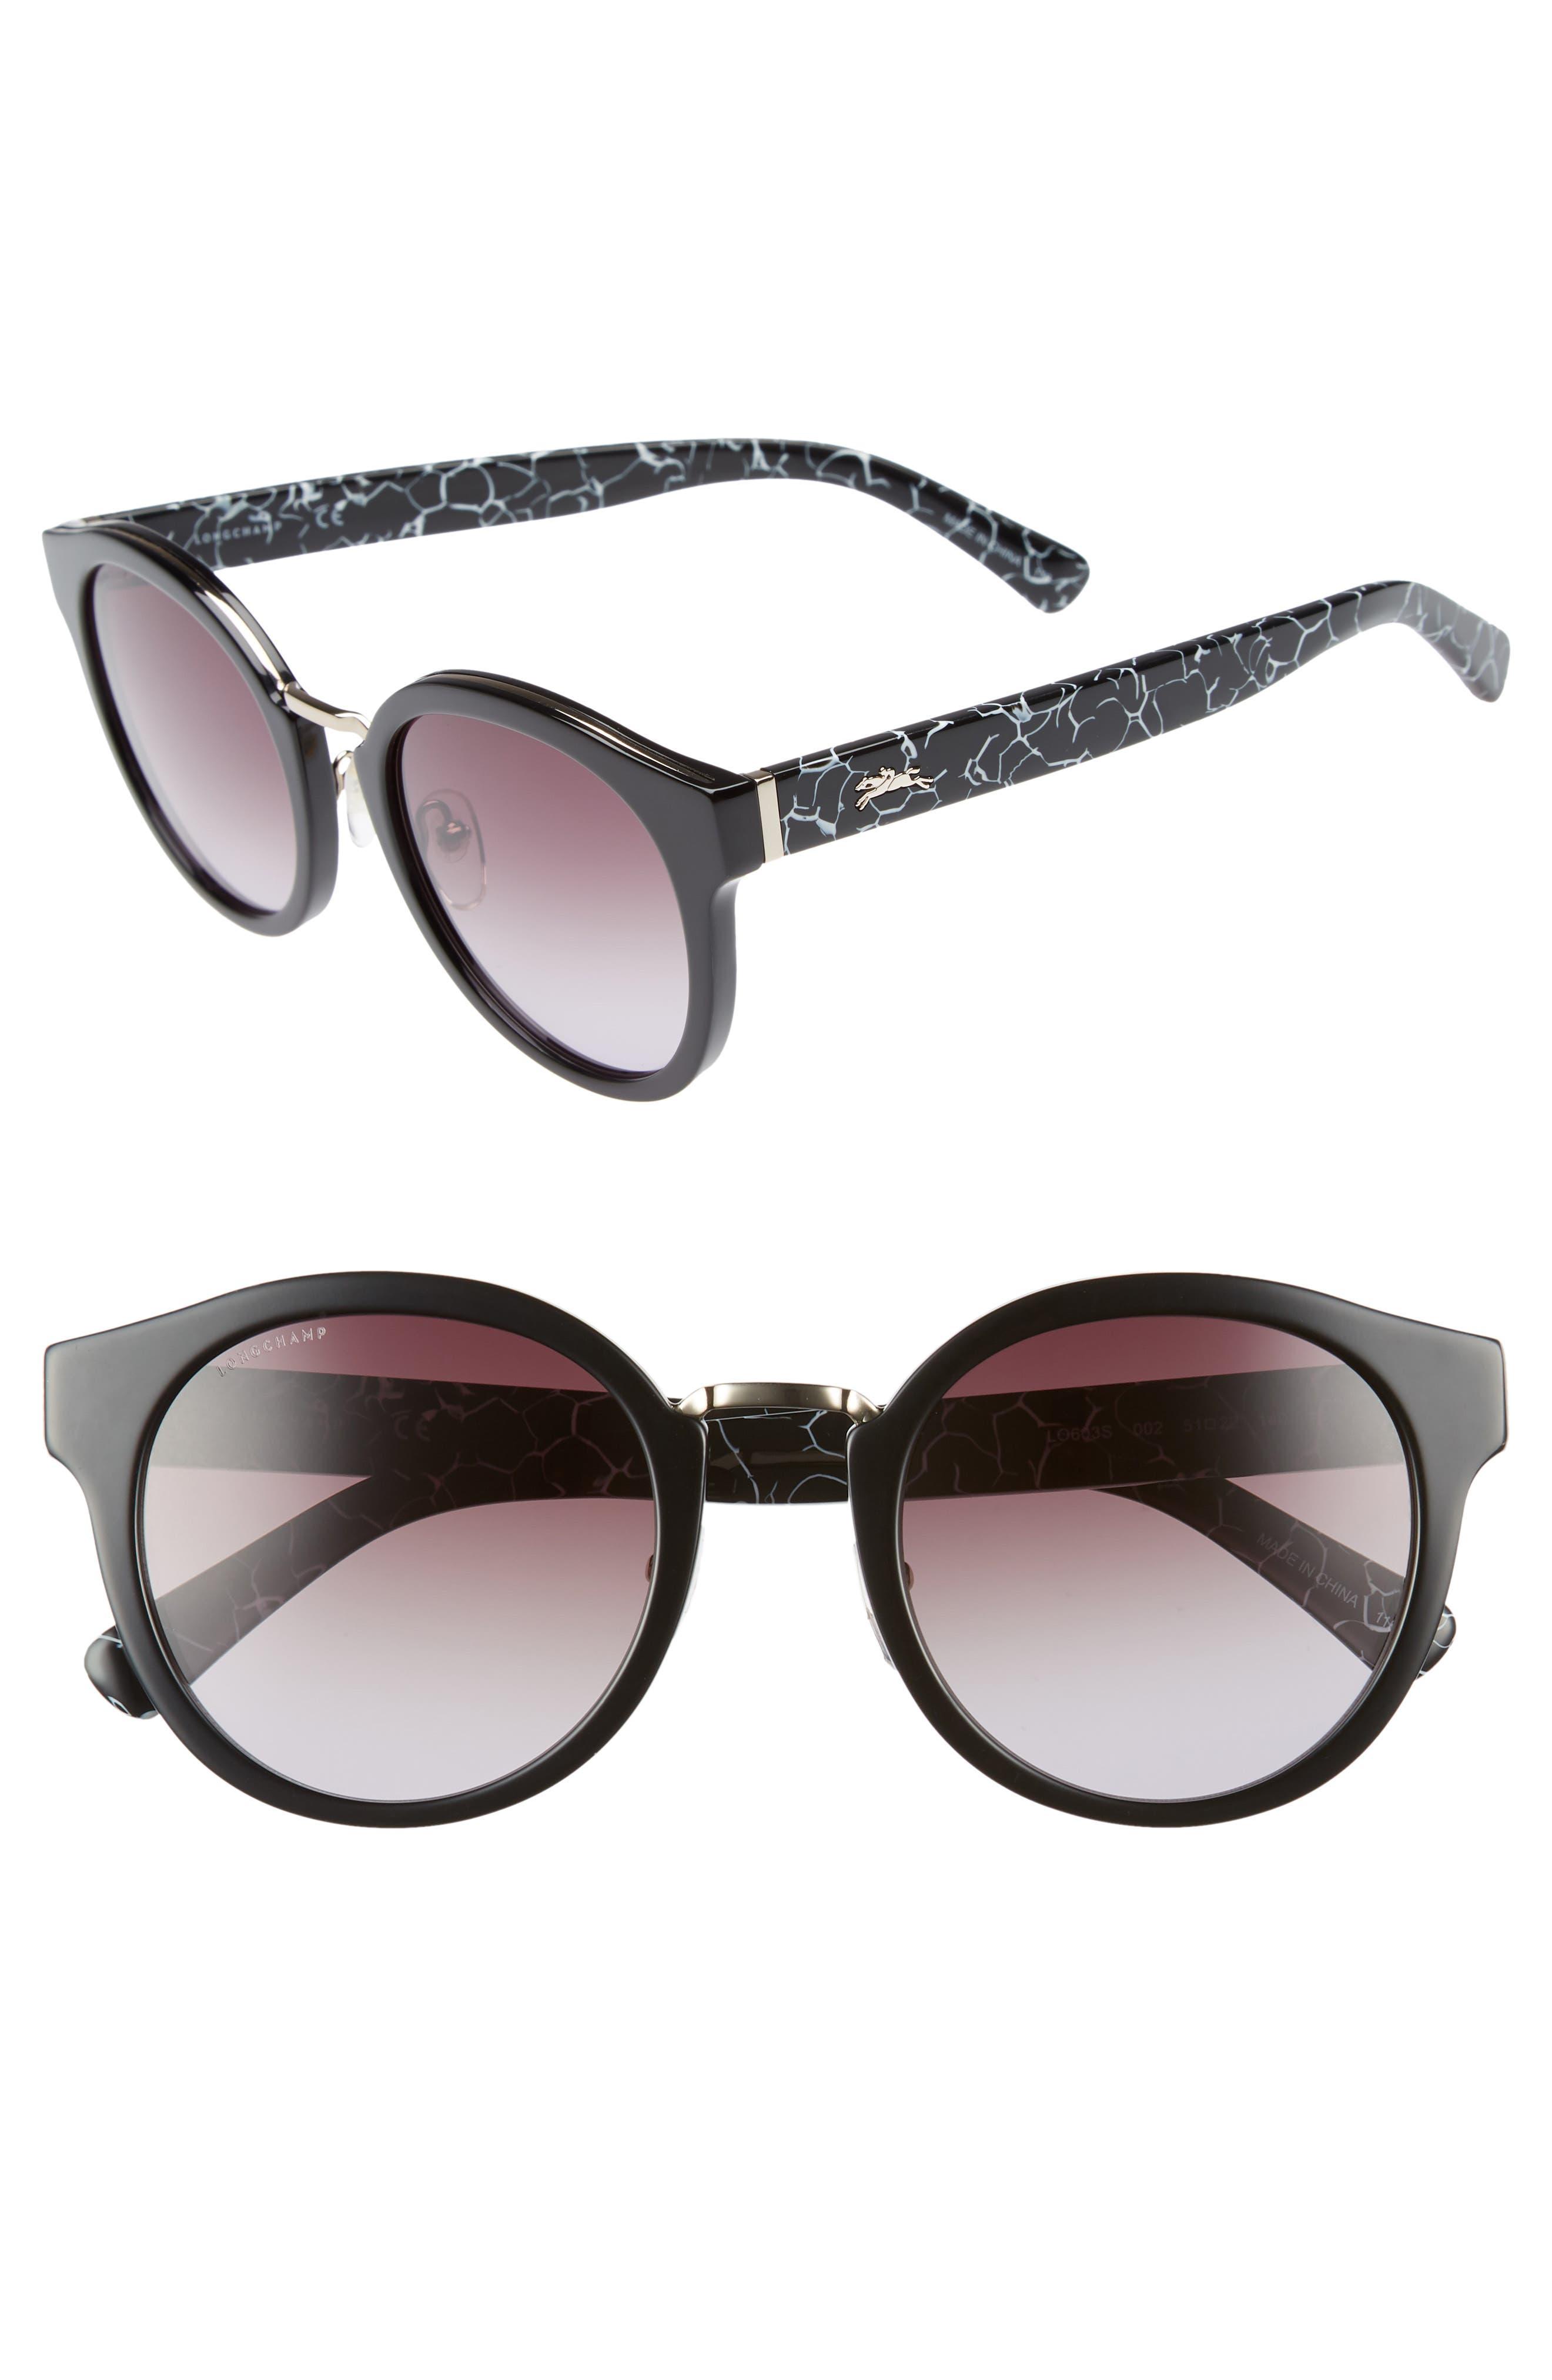 51mm Round Sunglasses,                             Main thumbnail 1, color,                             MARBLE BLACK